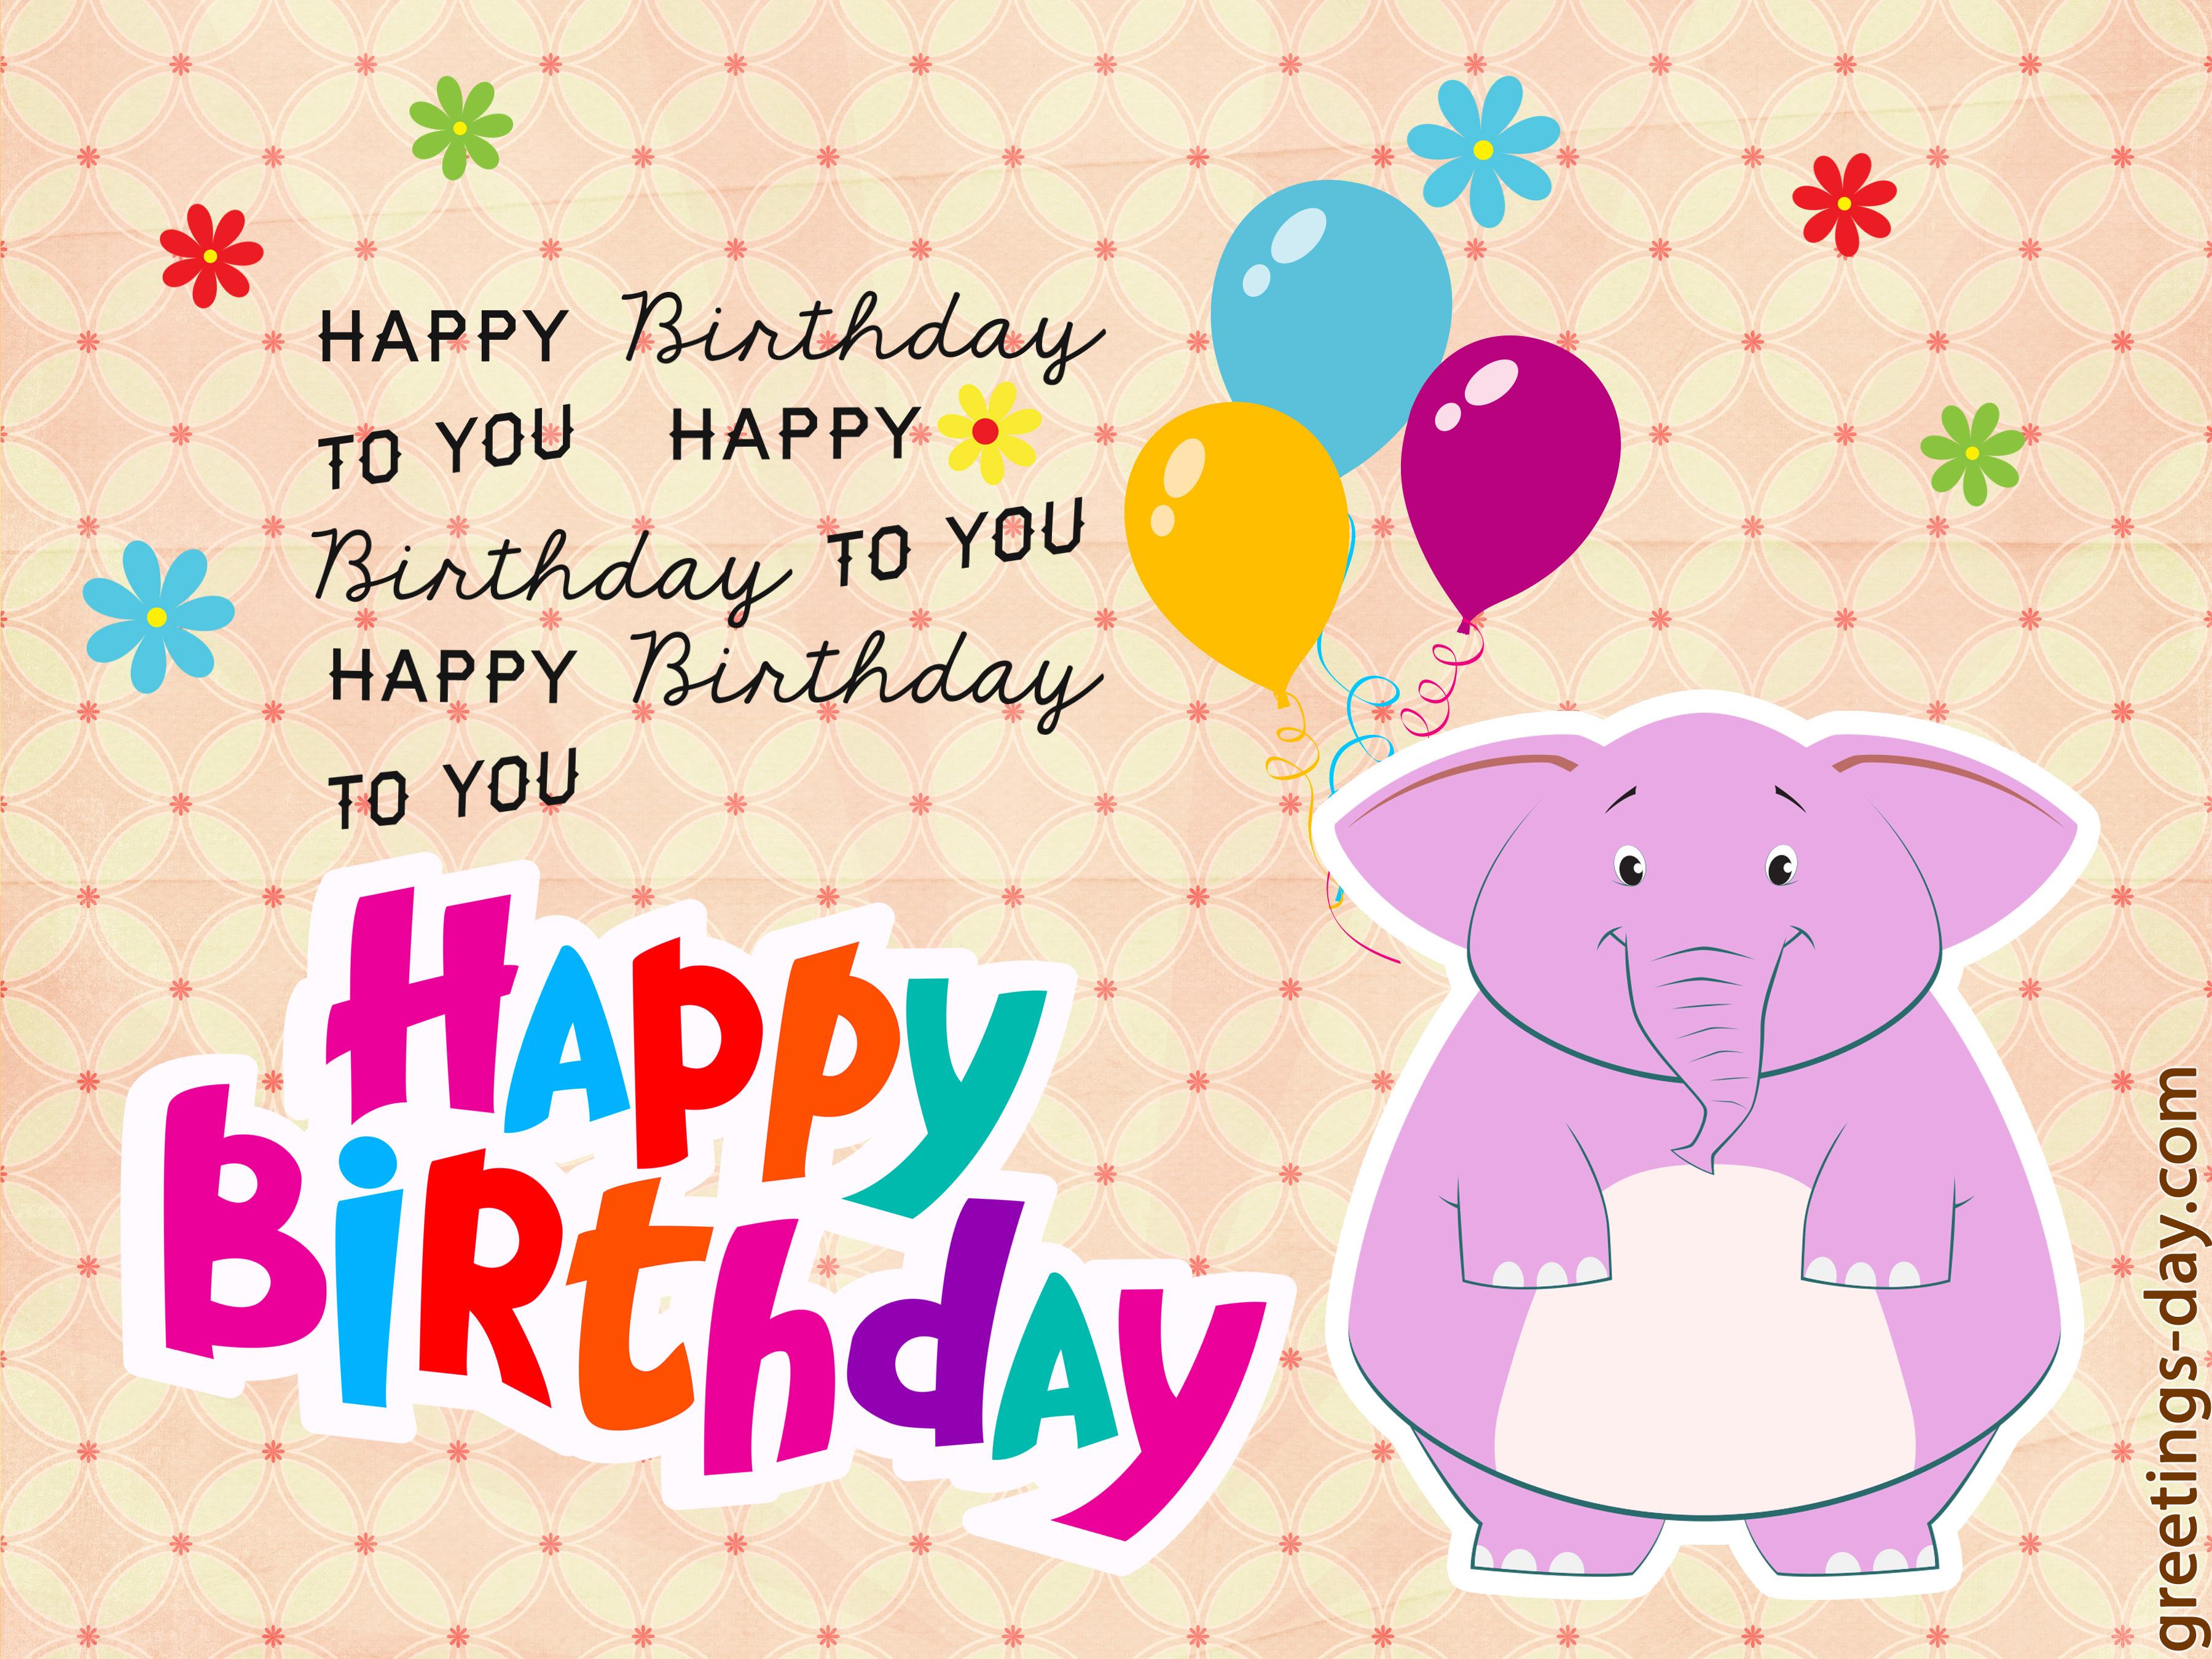 Happy Birthday card 23 06 14 ⋆ Greeting Cards Animated